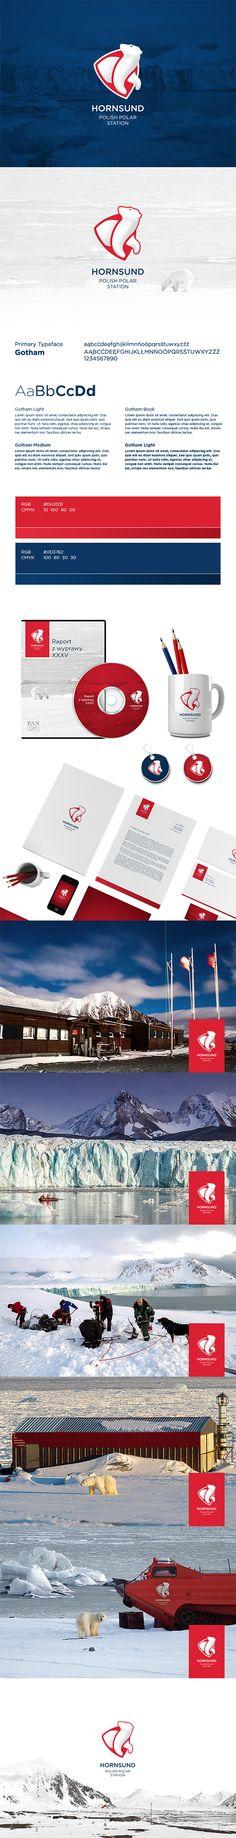 Hornsund Polish Polar Station by Leszek Jędraszczak, via Behance